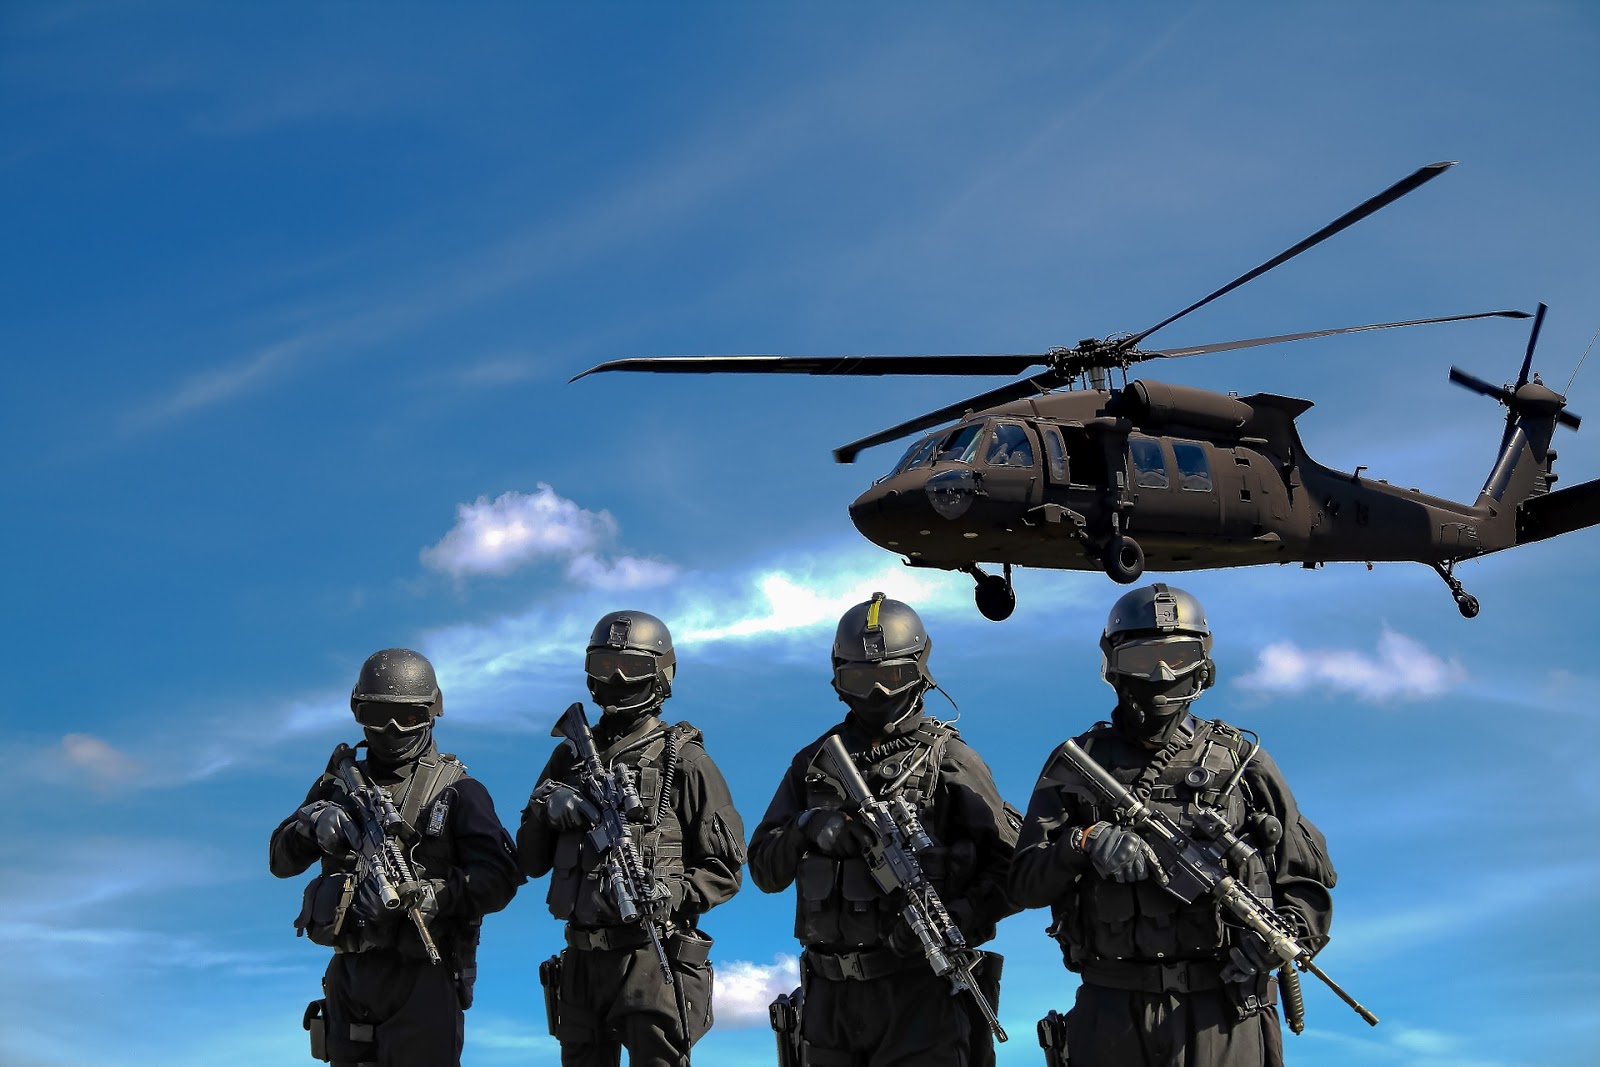 Helikopterle Aynı Karede Olan Askerler